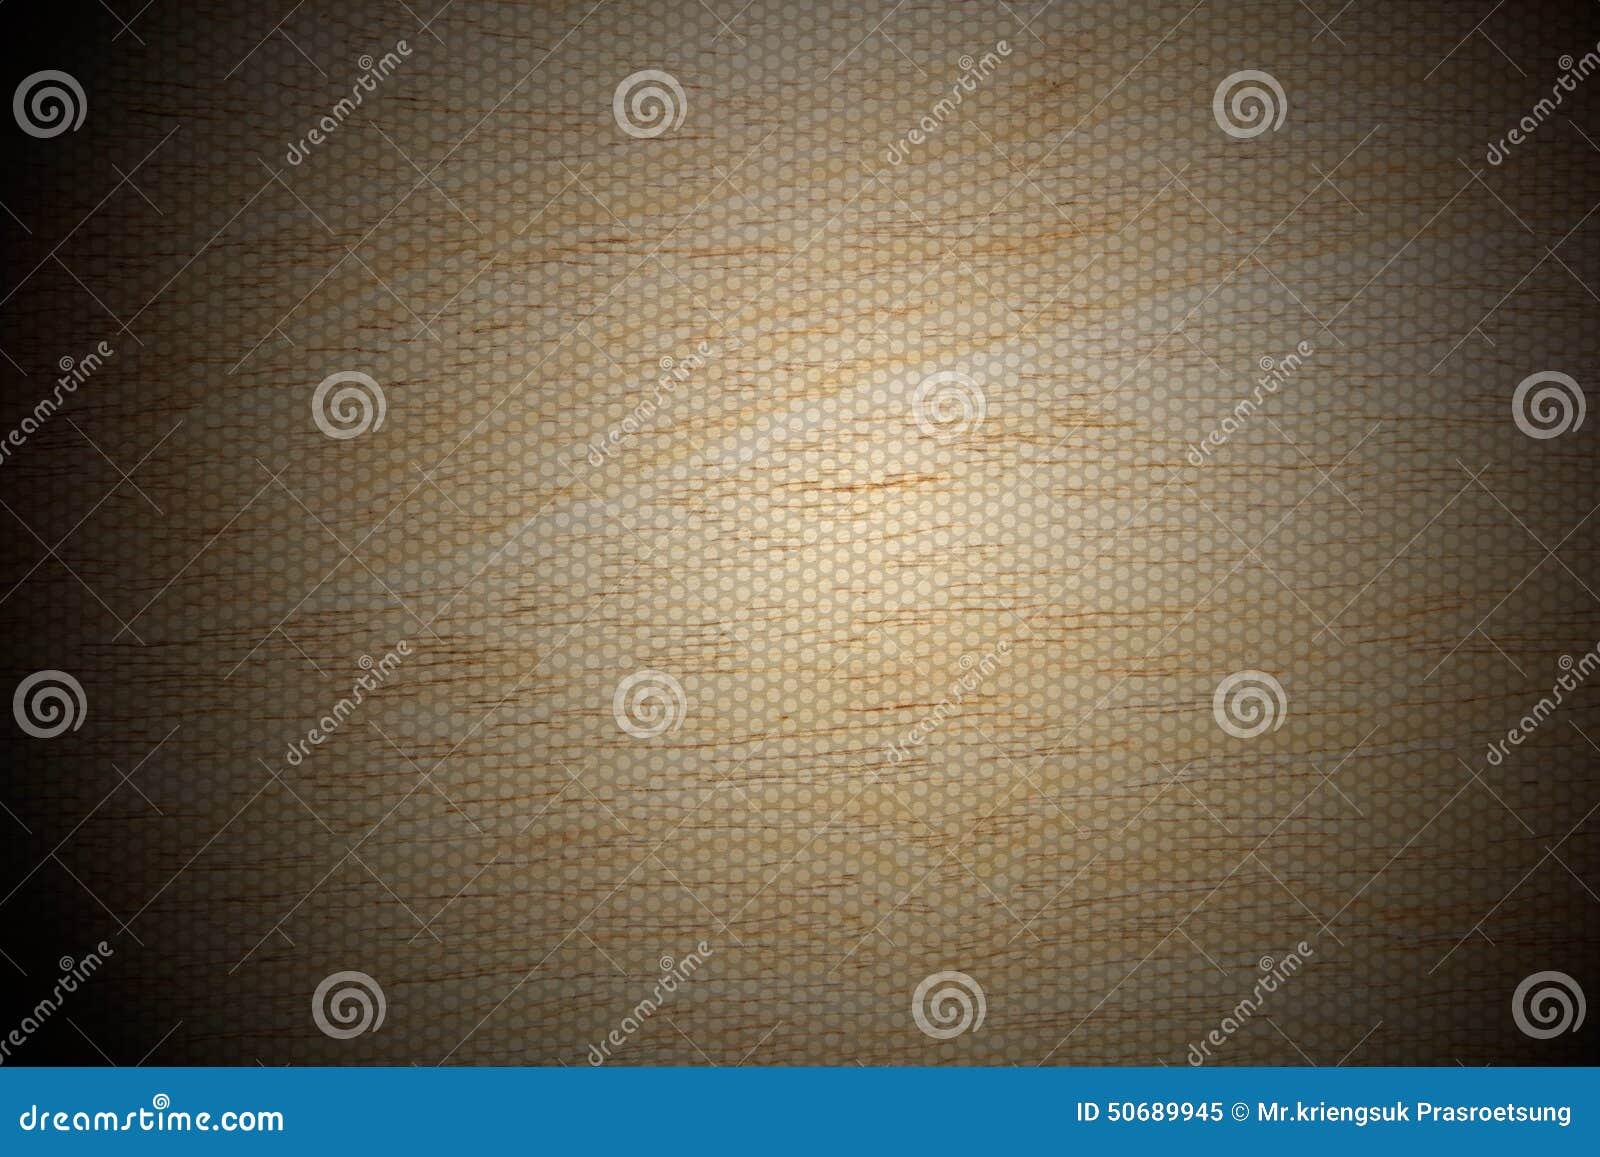 Download 木背景 库存图片. 图片 包括有 墙纸, 户外, 剪切, 坦率, 木头, 背包, 墙壁, 放光, 场面, 板条 - 50689945